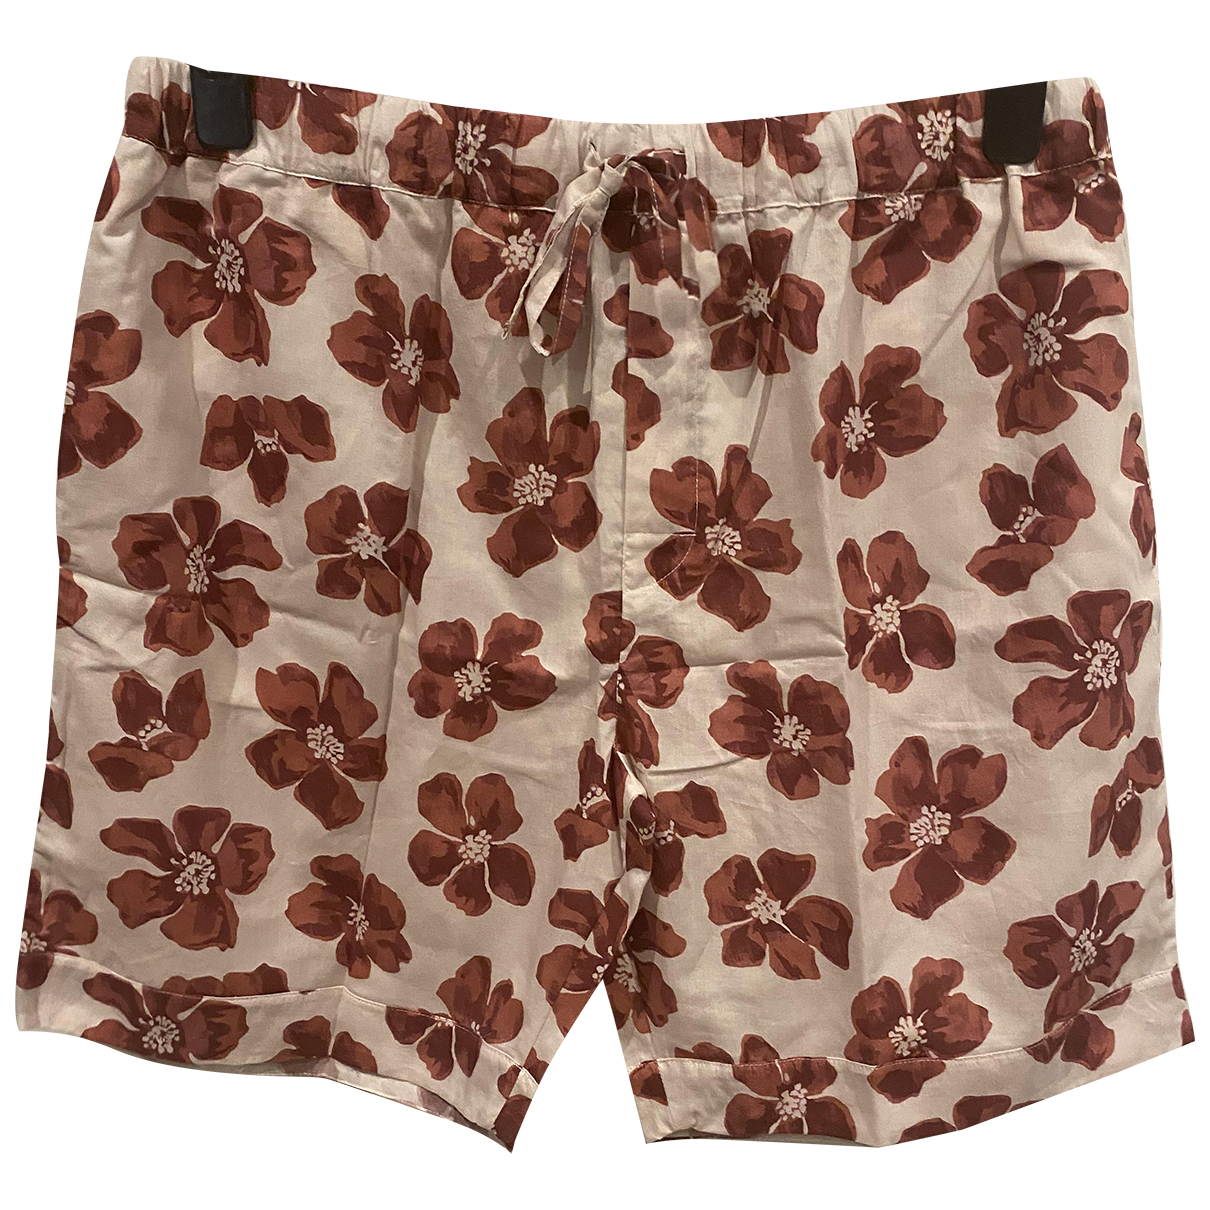 Desmond & Dempsey \N Red Cotton Shorts for Men XL International